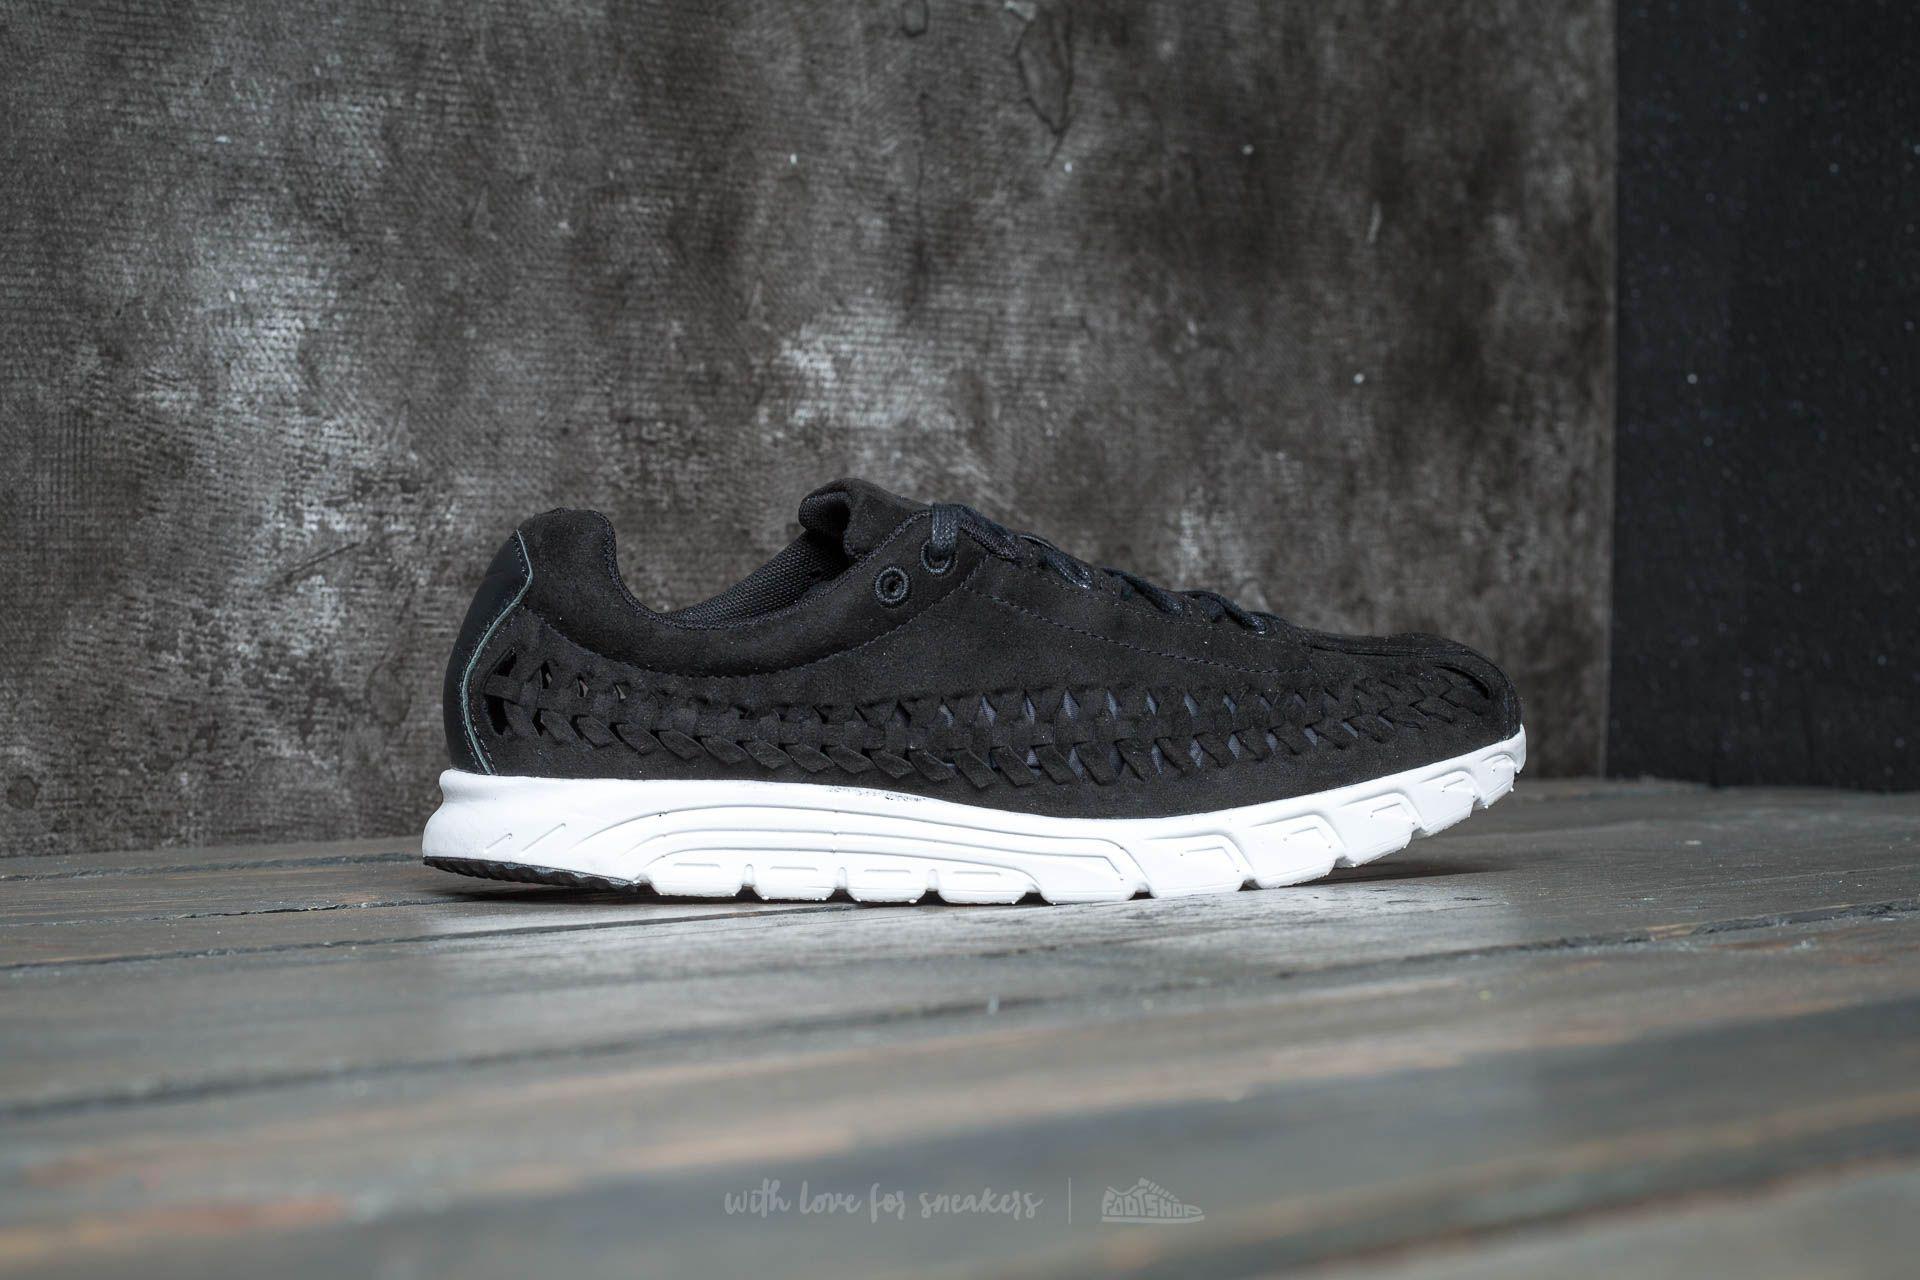 7e7071c010c91b Lyst - Nike Mayfly Woven Black  Black-summit White in Black for Men